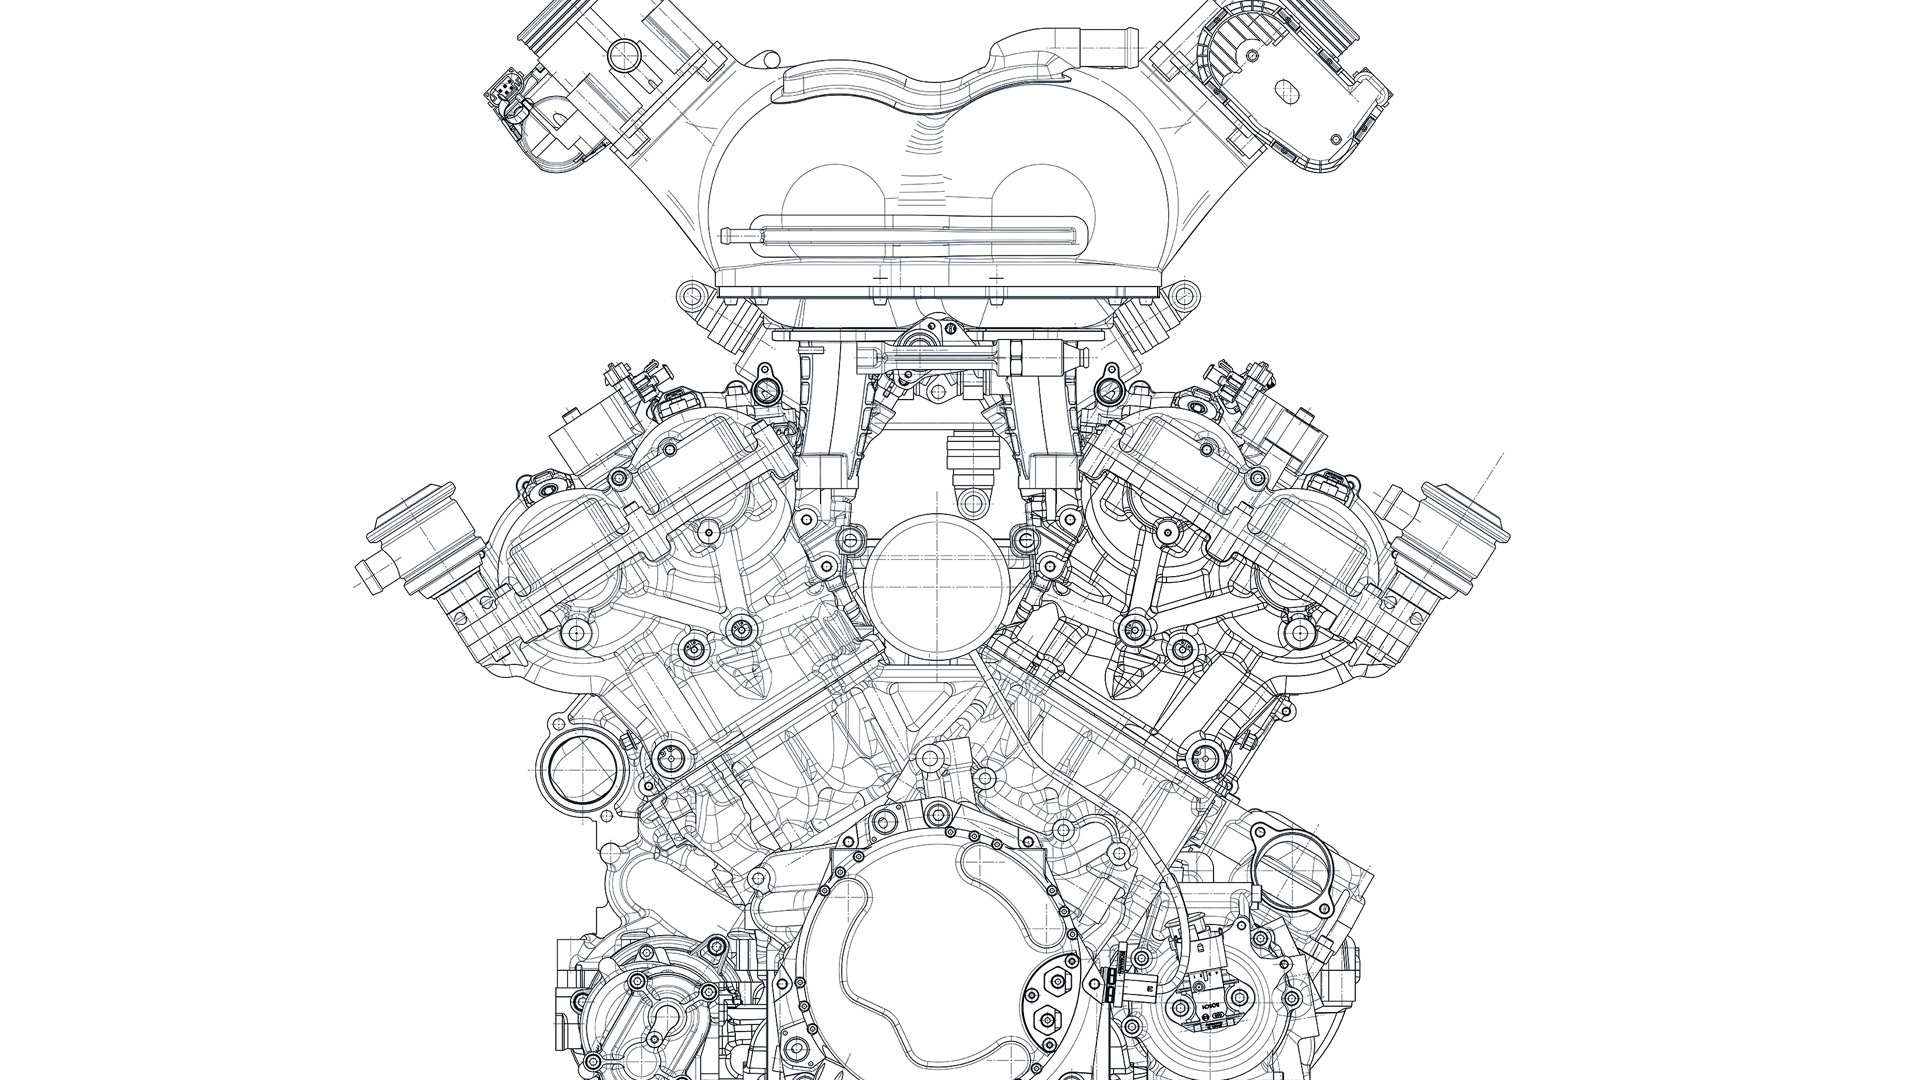 GMA T50's 3.9-liter V-12